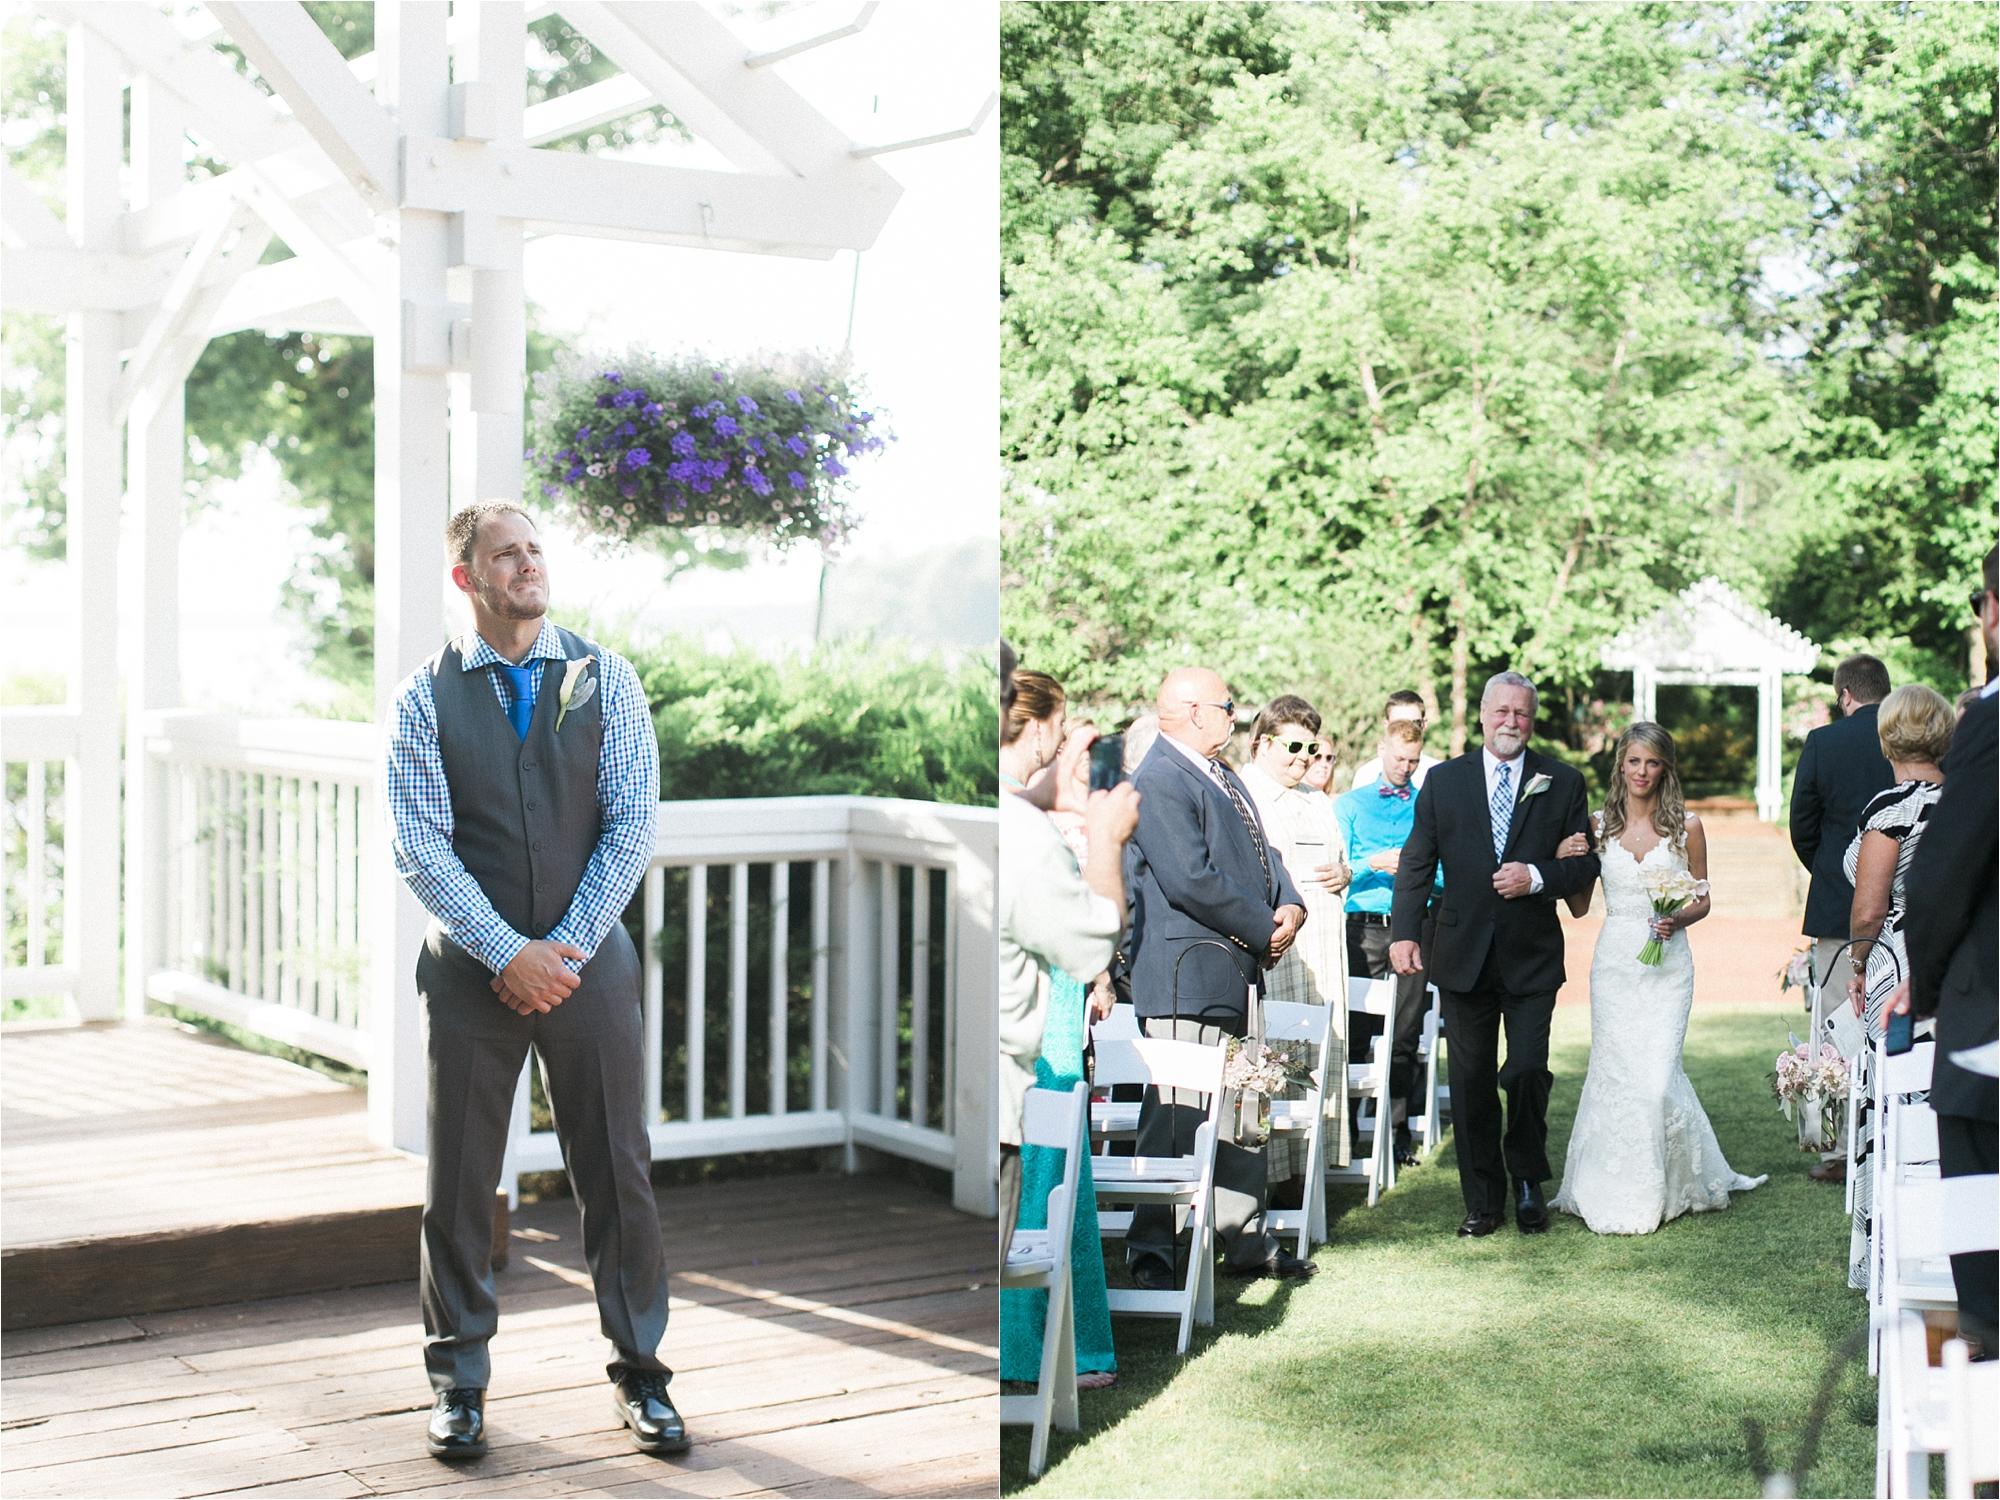 stephanie-yonce-boathouse-sunday-park-virginia-wedding-photo-015.JPG